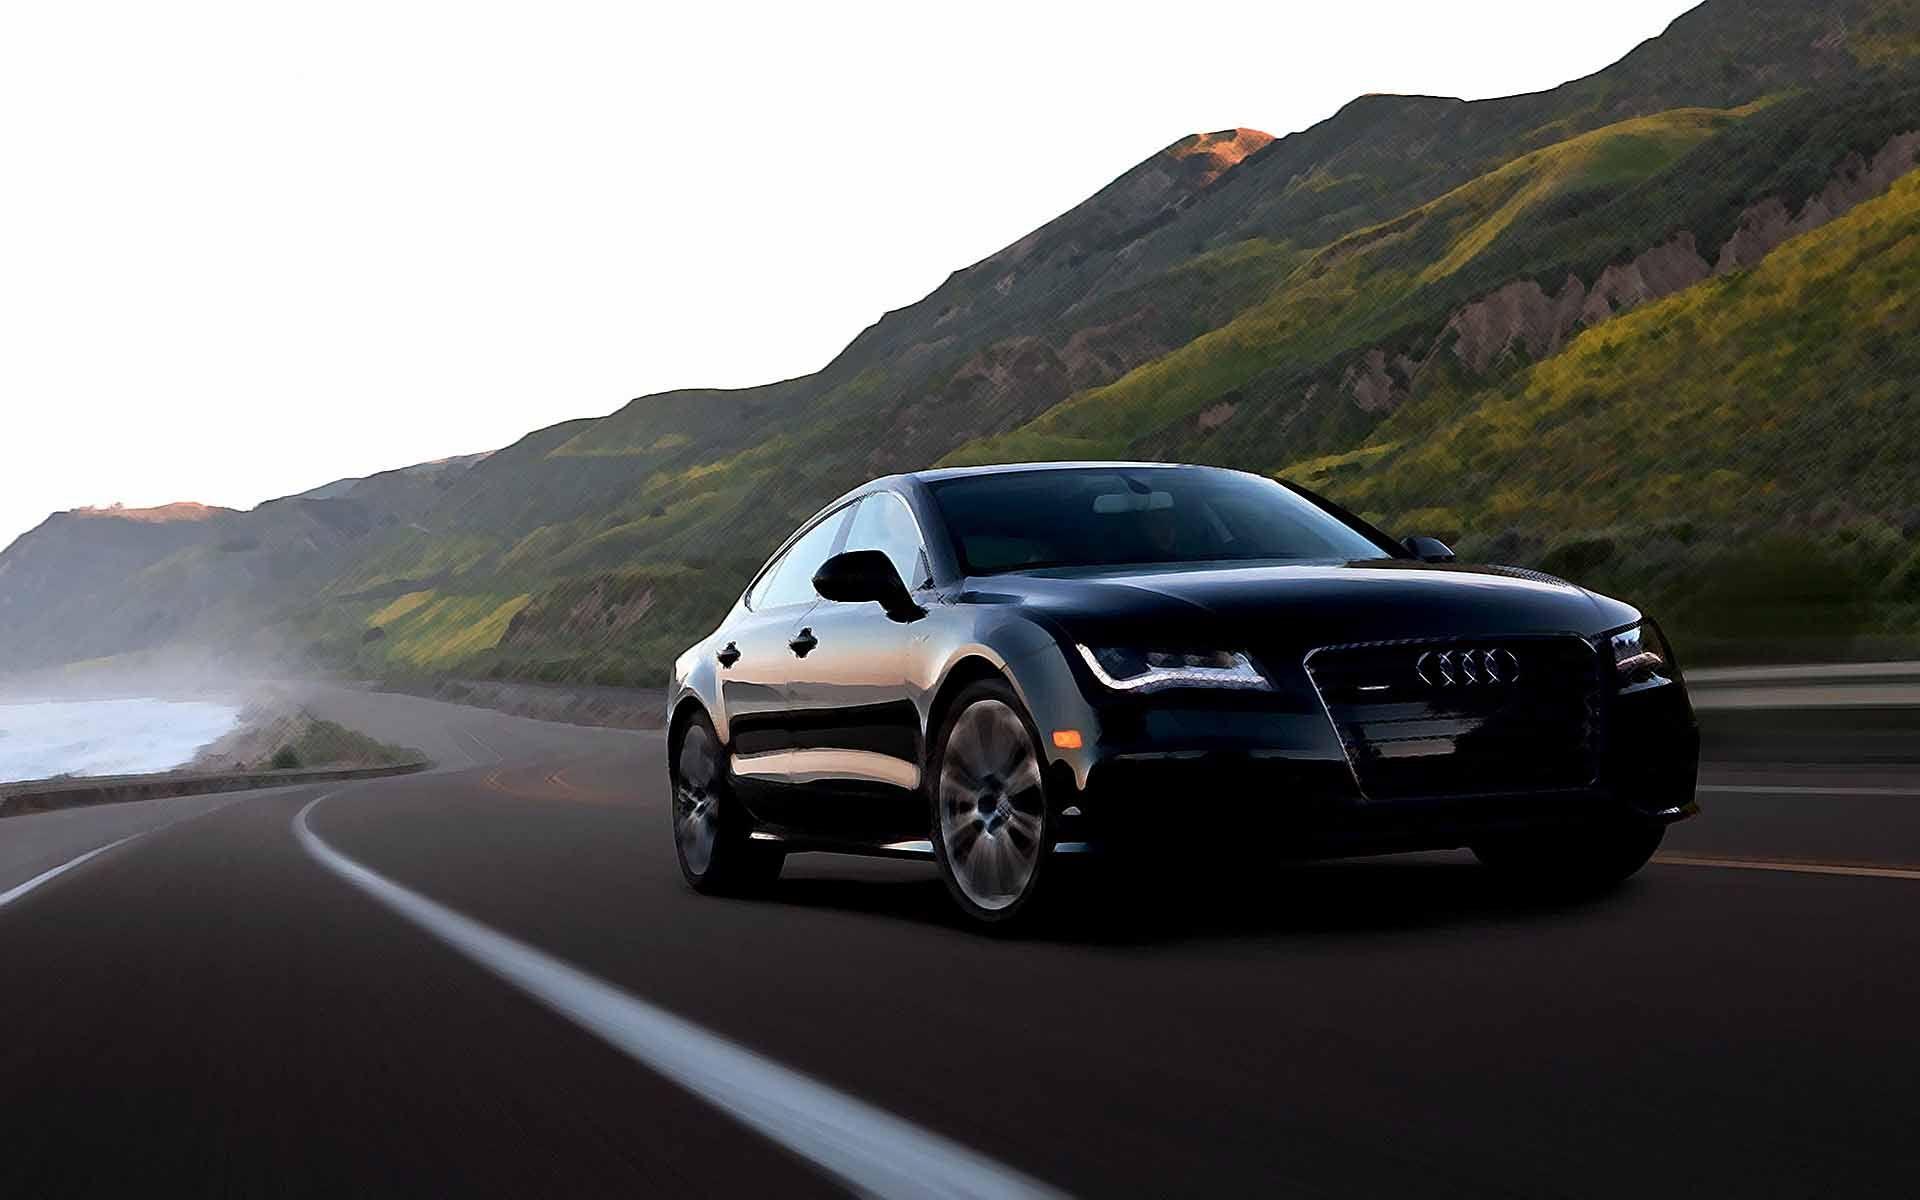 Audi A3 8V Co rung – Auto Bild Idee